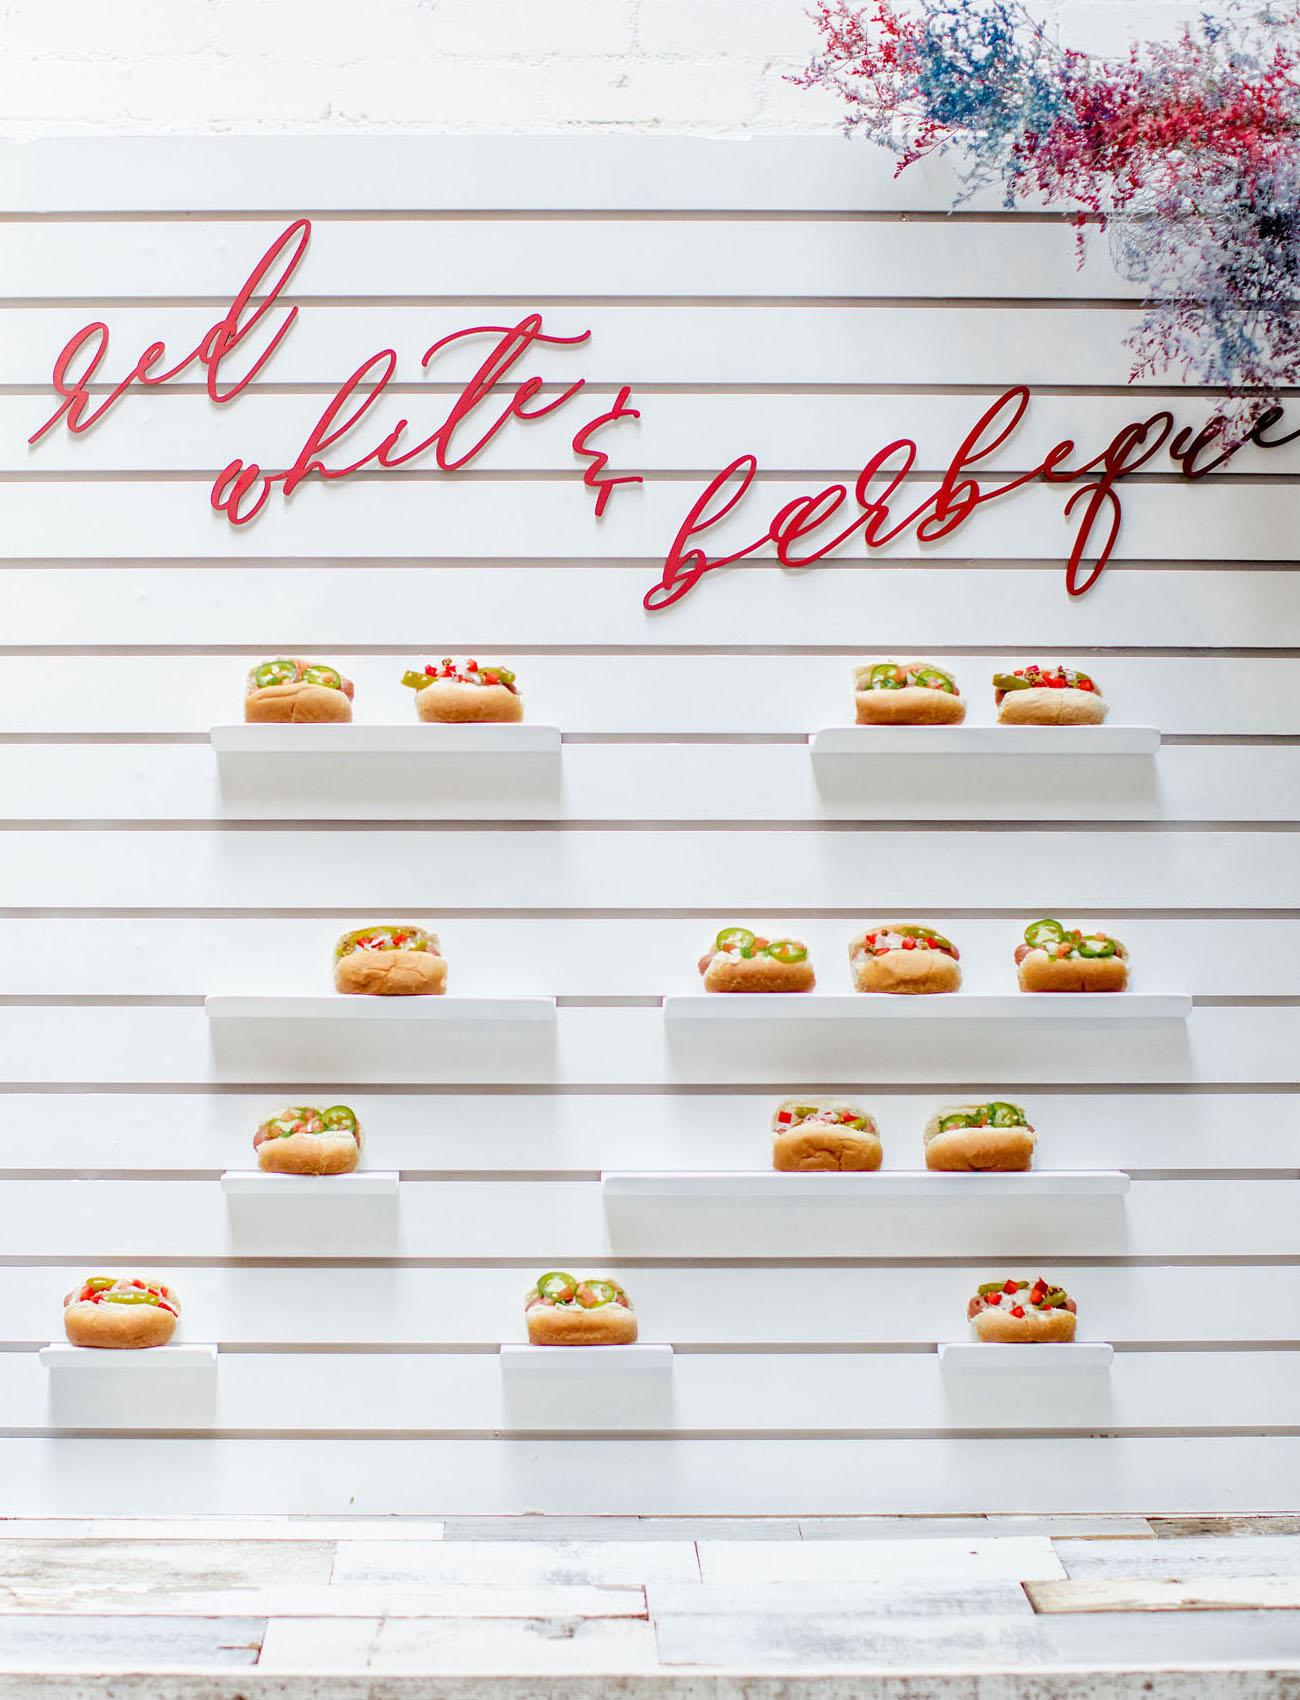 hot dog escort card display